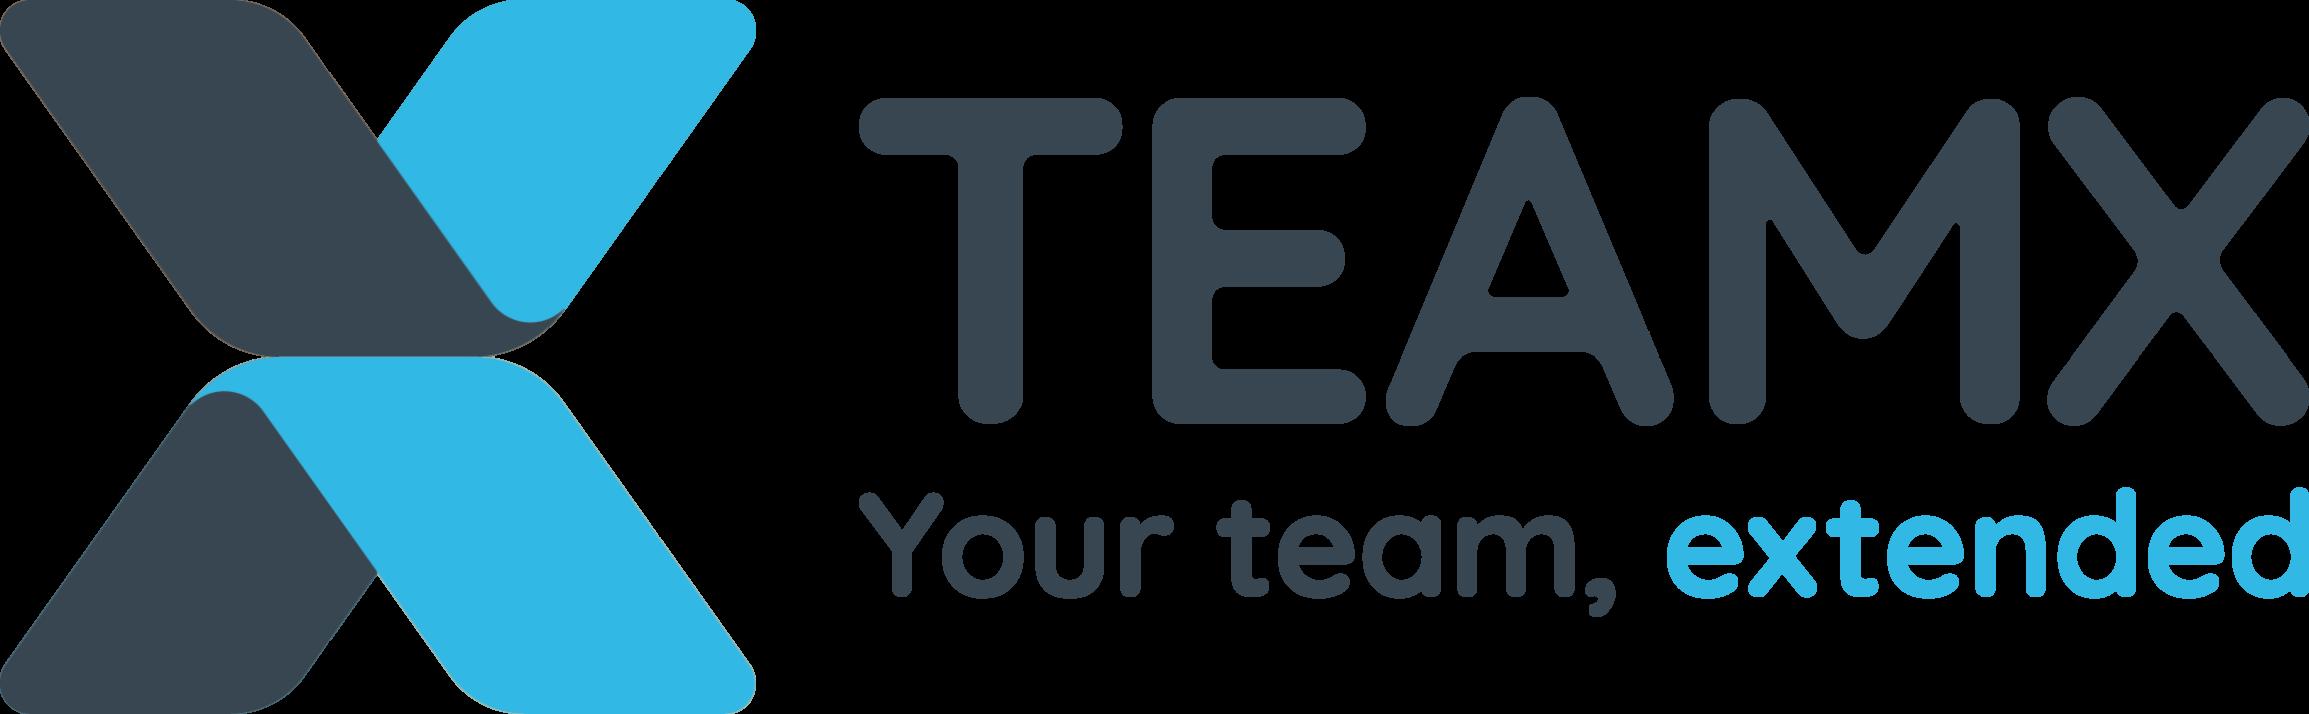 Team Extended